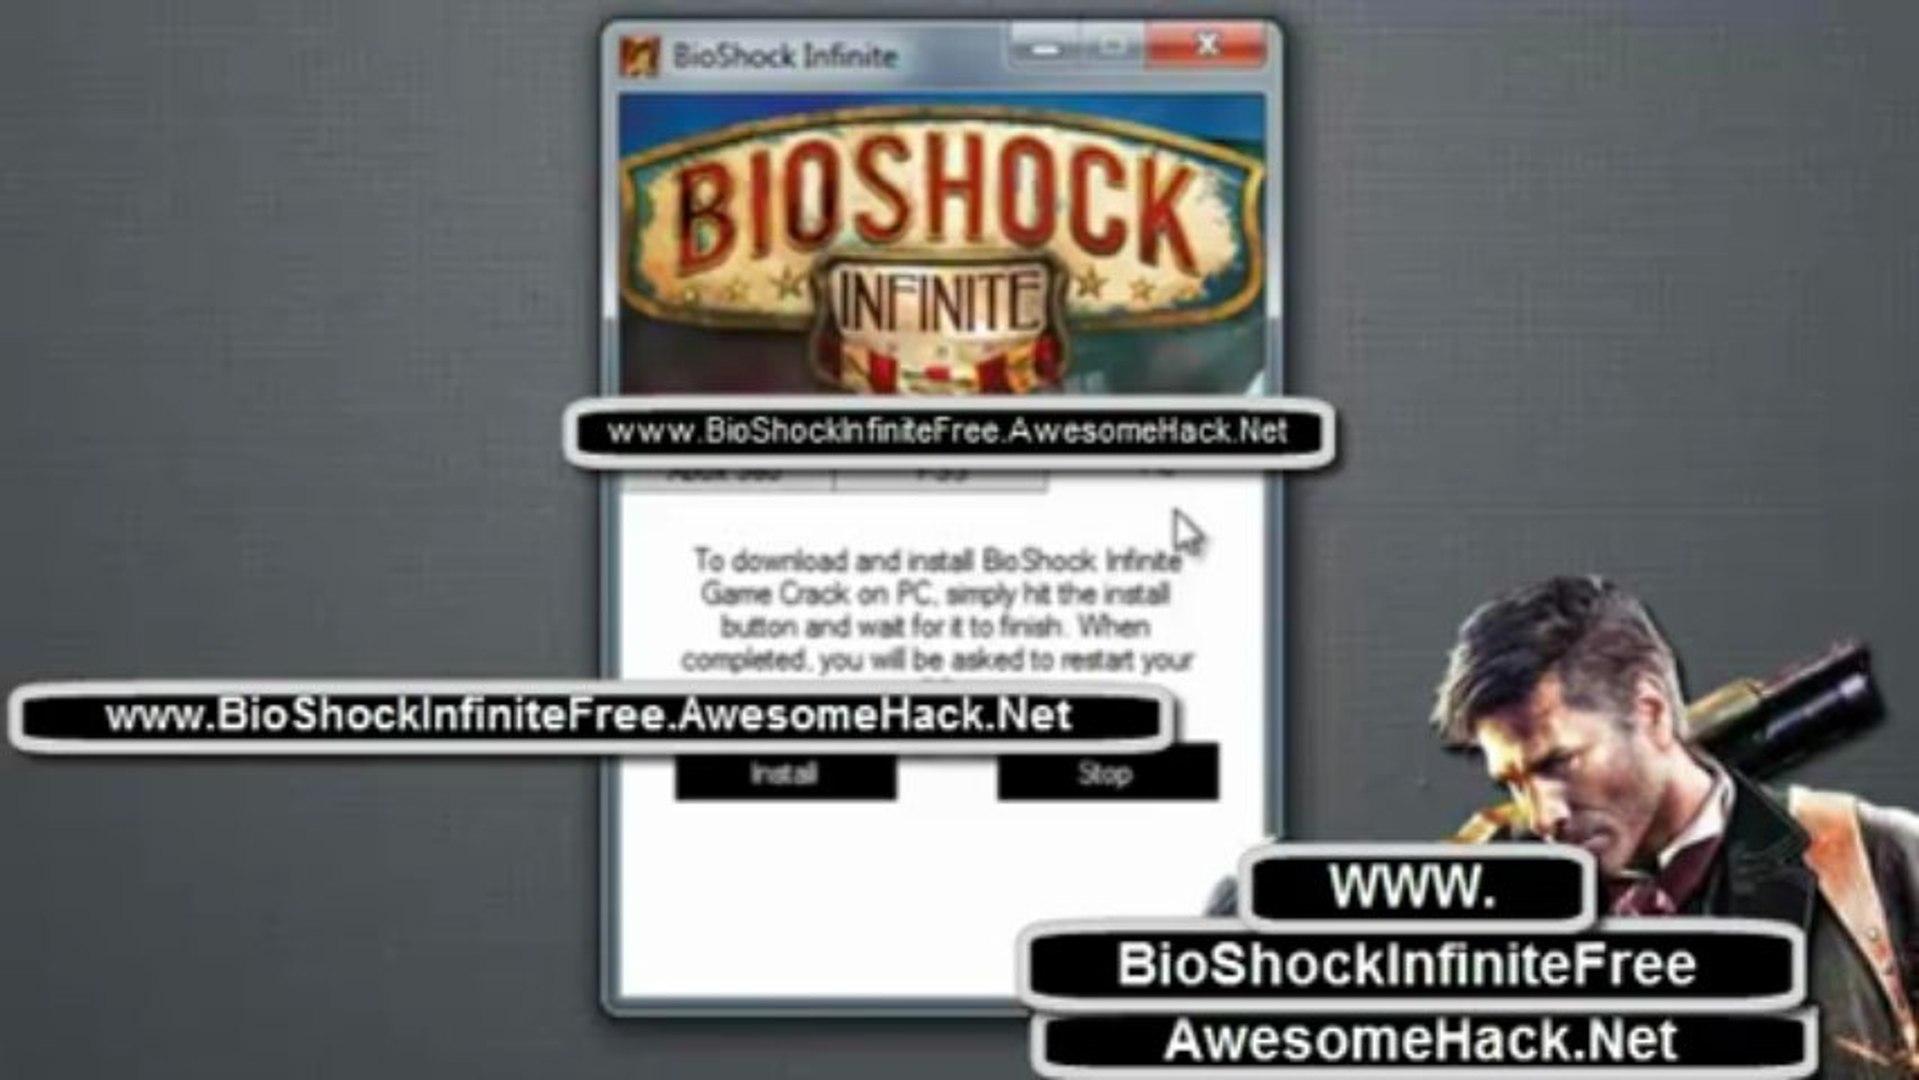 bioshock infinite download free